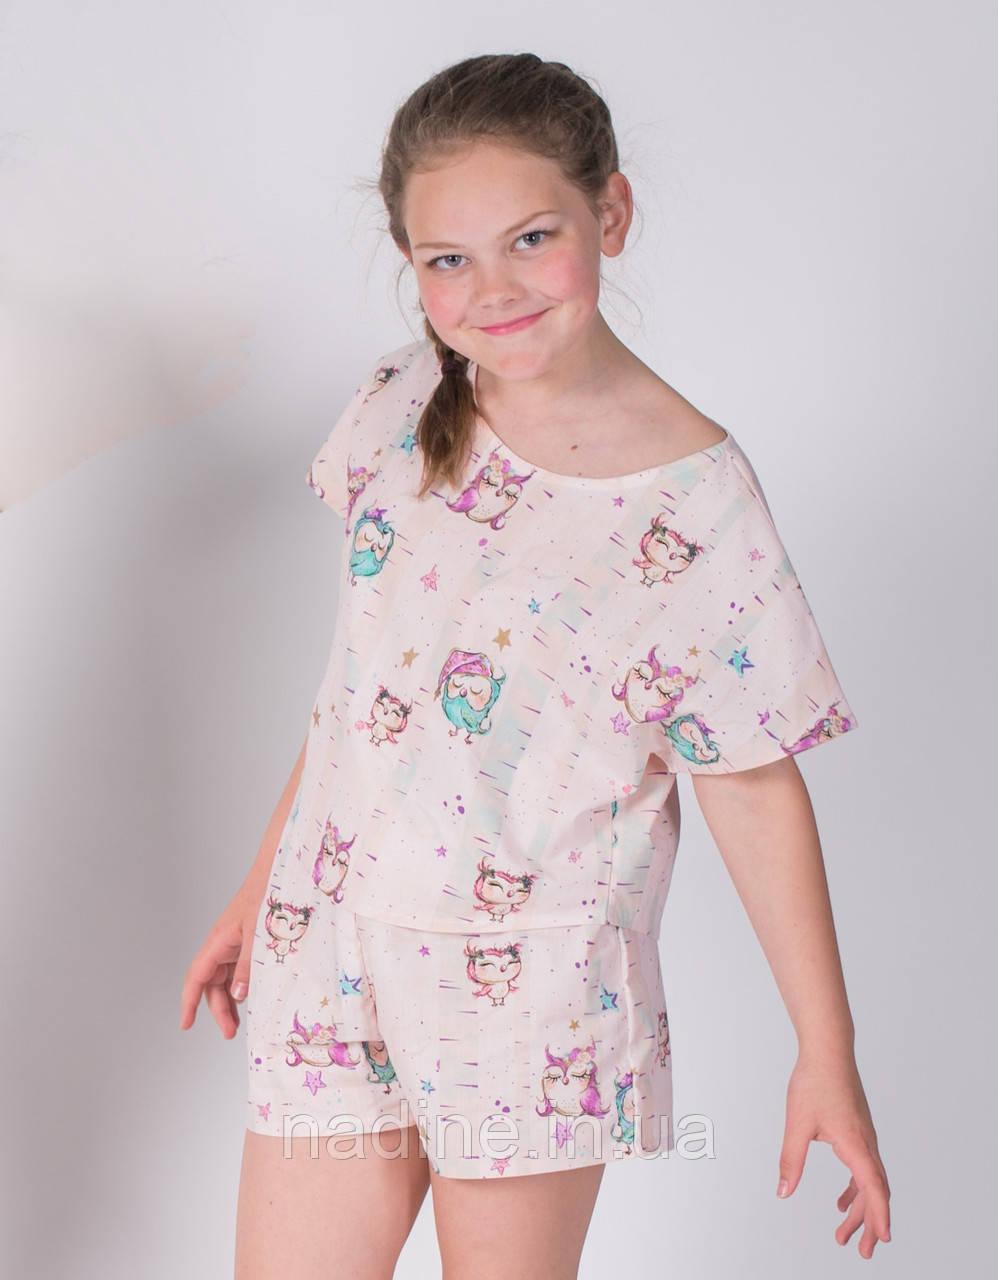 Пижама на девочку Eirena Nadine (783-40) 140/34  персиковый